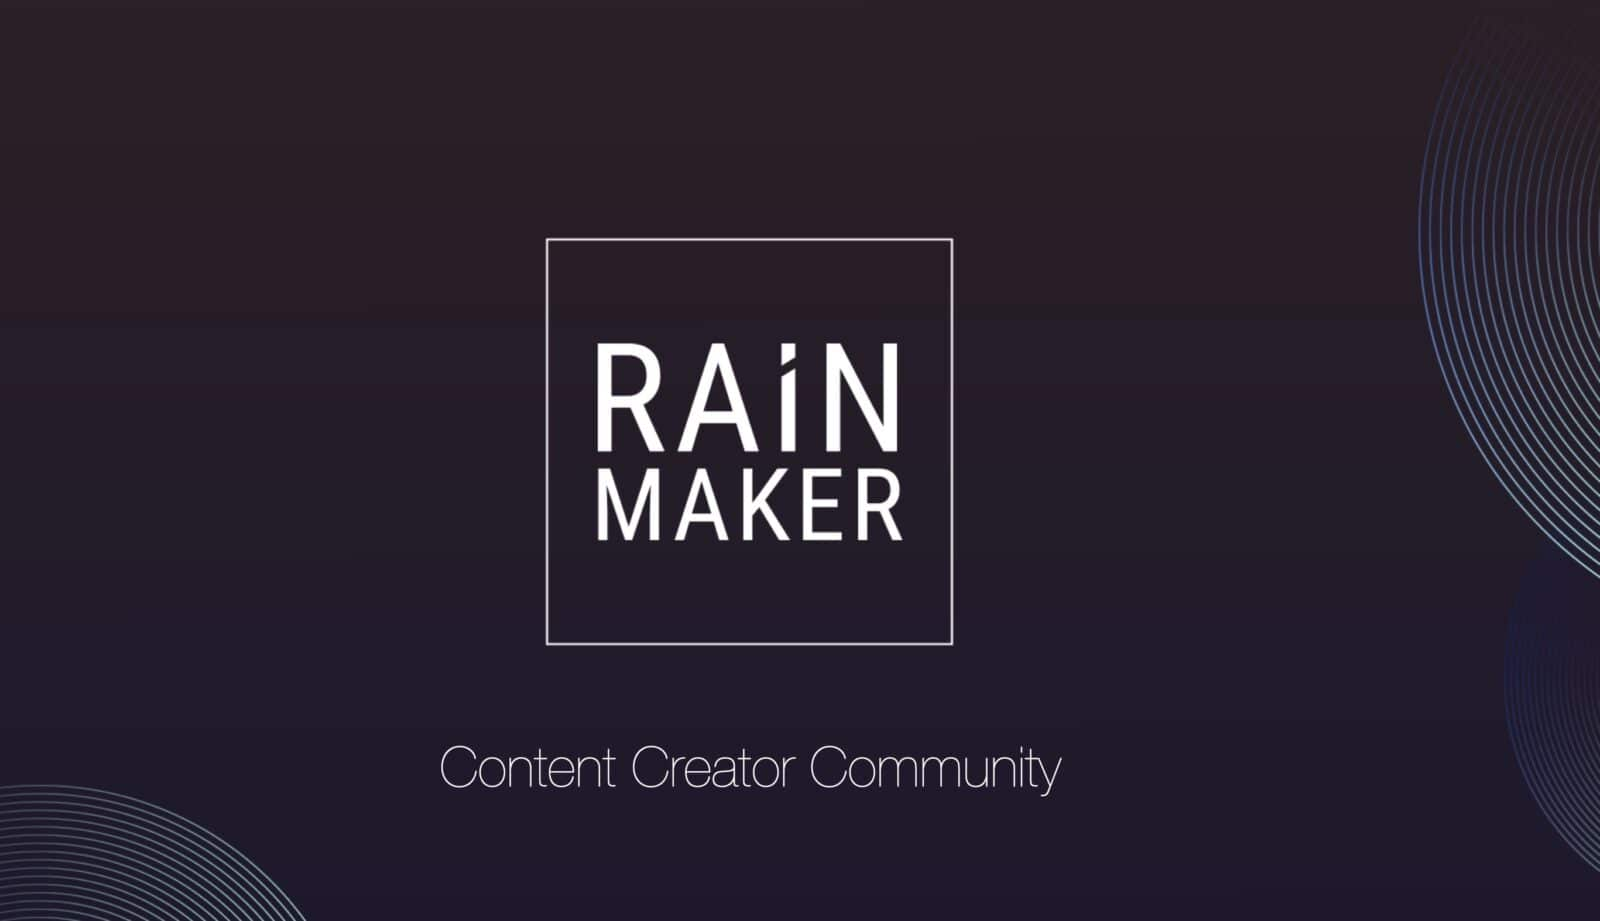 RAiNMaker ฉลองครบรอบ 2 ปี ชุมชนครีเอเตอร์ในไทย เปิดรับงานโฆษณาครั้งแรก !!